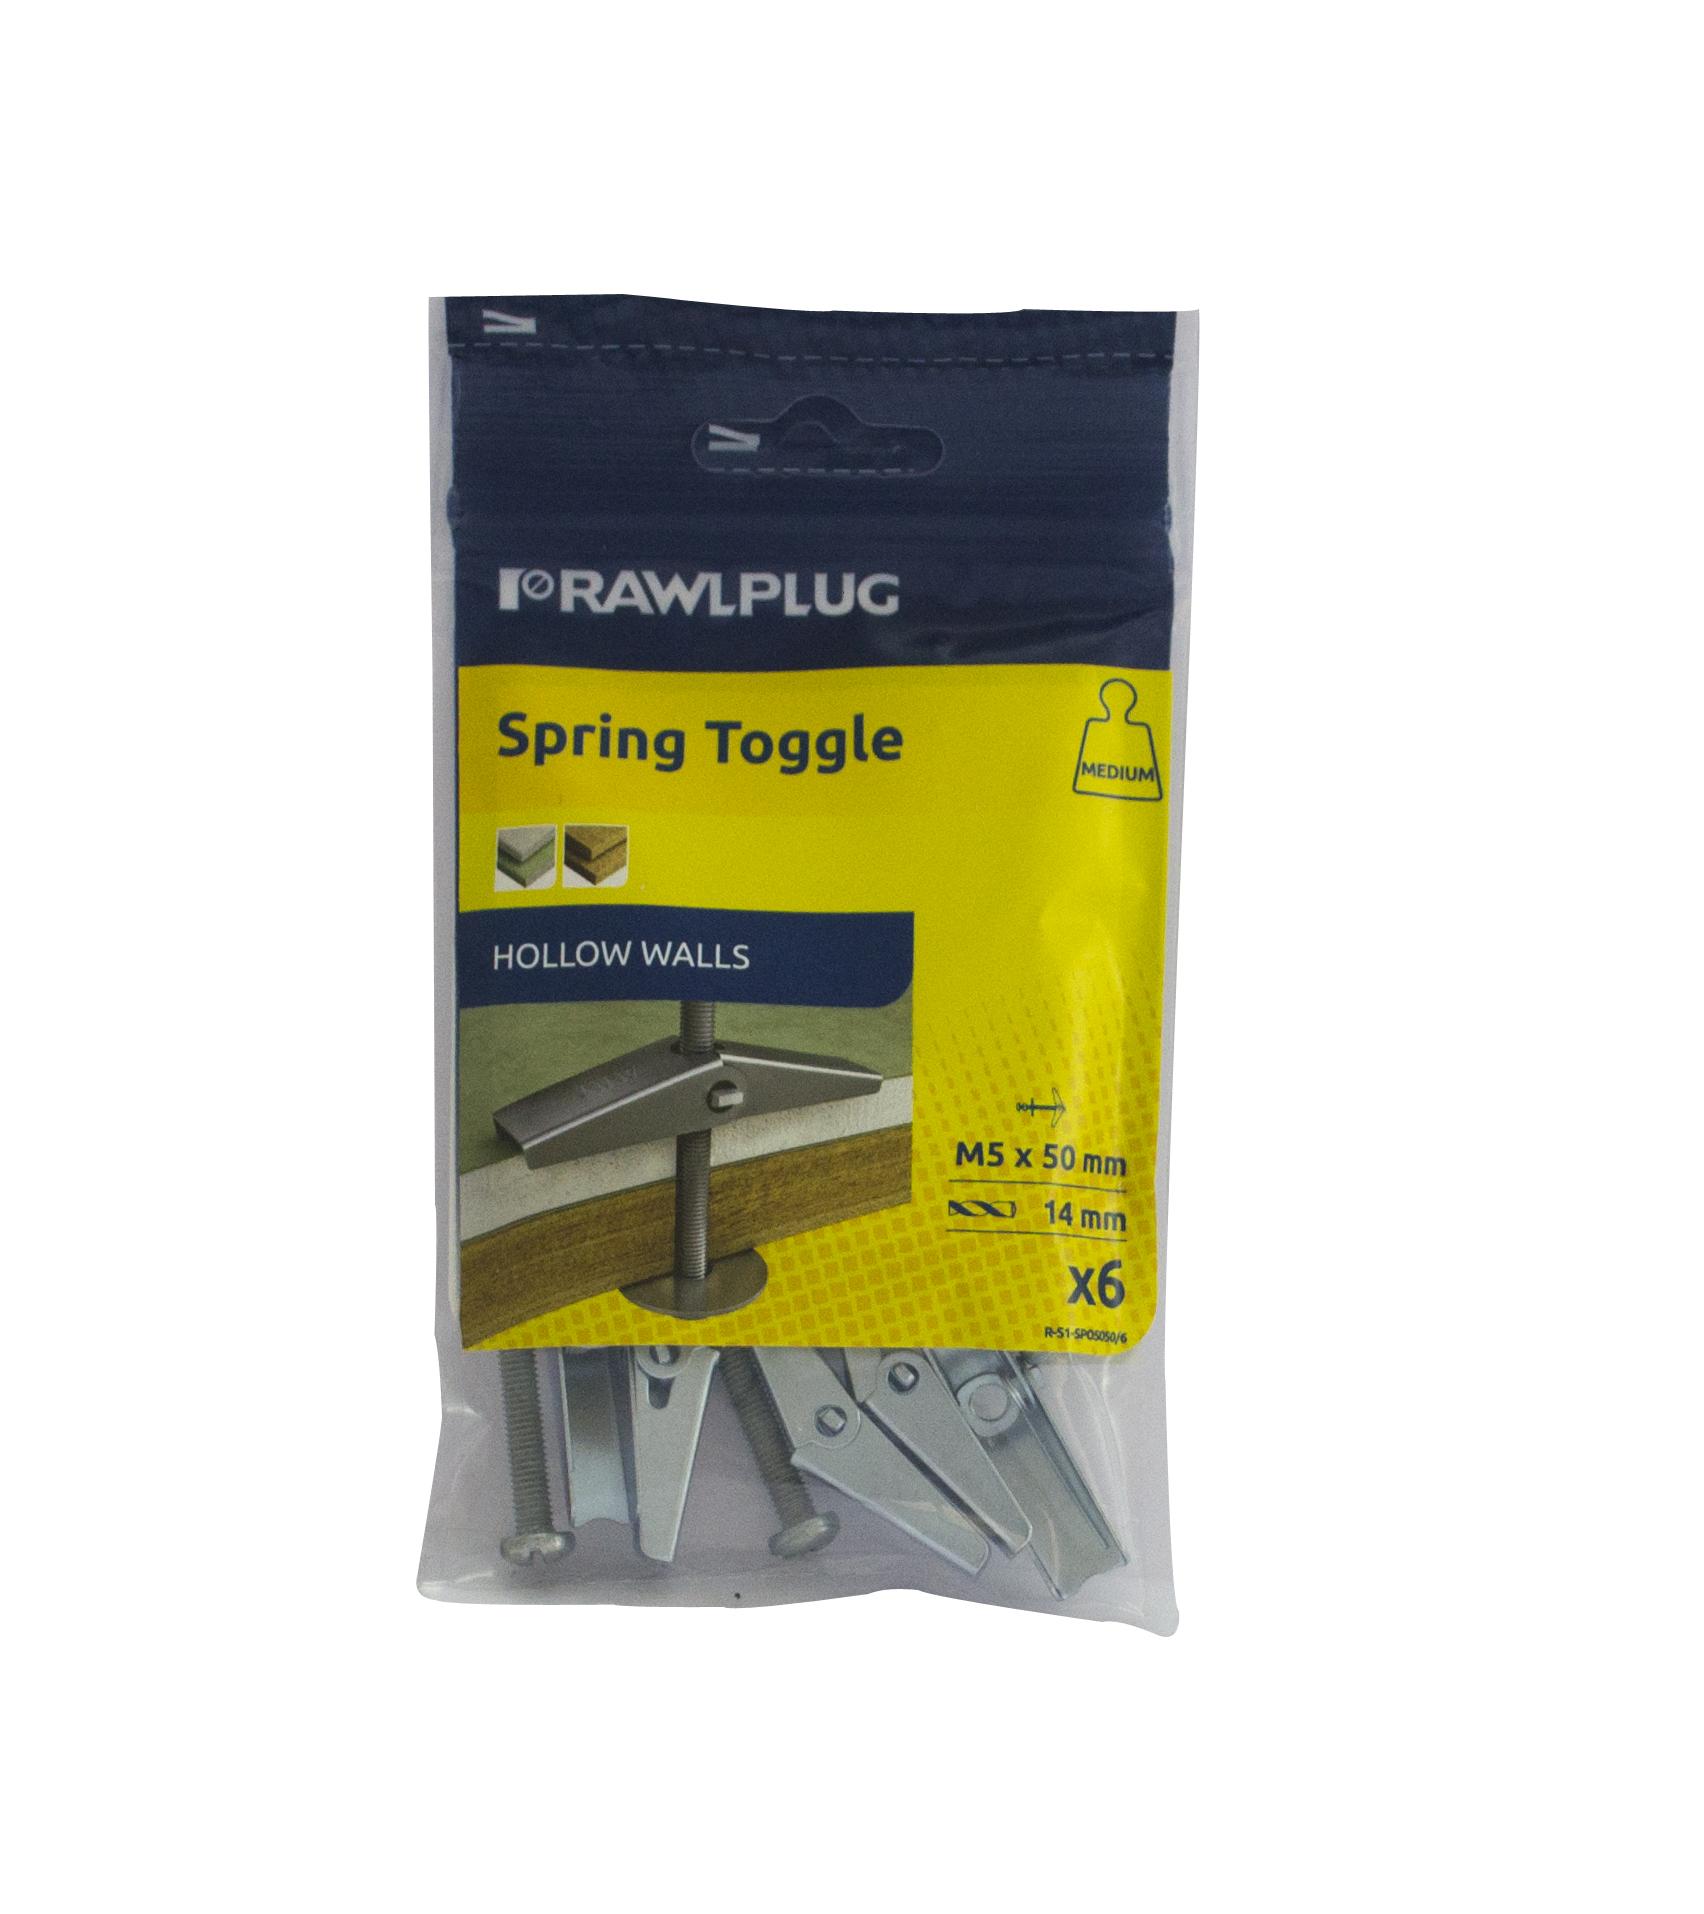 Rawl Trade Spring Toggle M5x50 (6pcs)